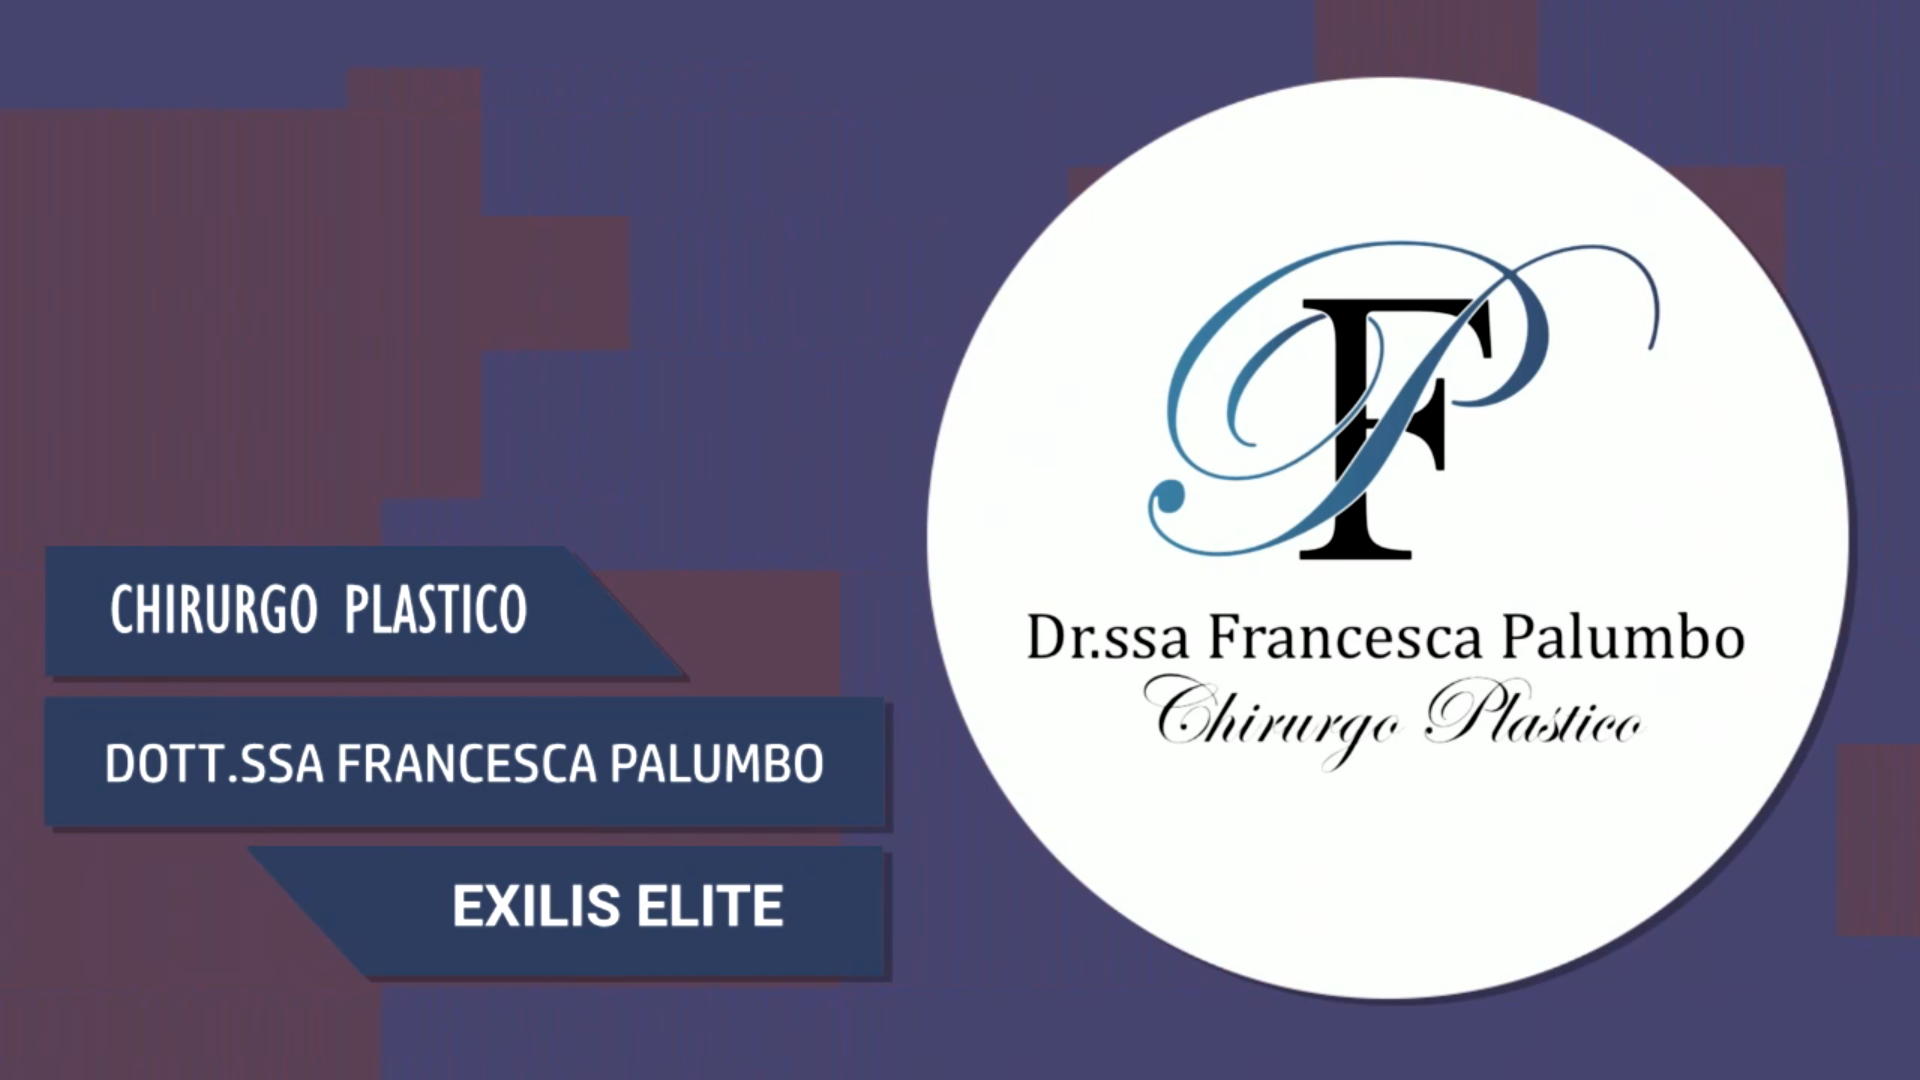 Intervista alla Dott.ssa Francesca Palumbo – Exilis Elite